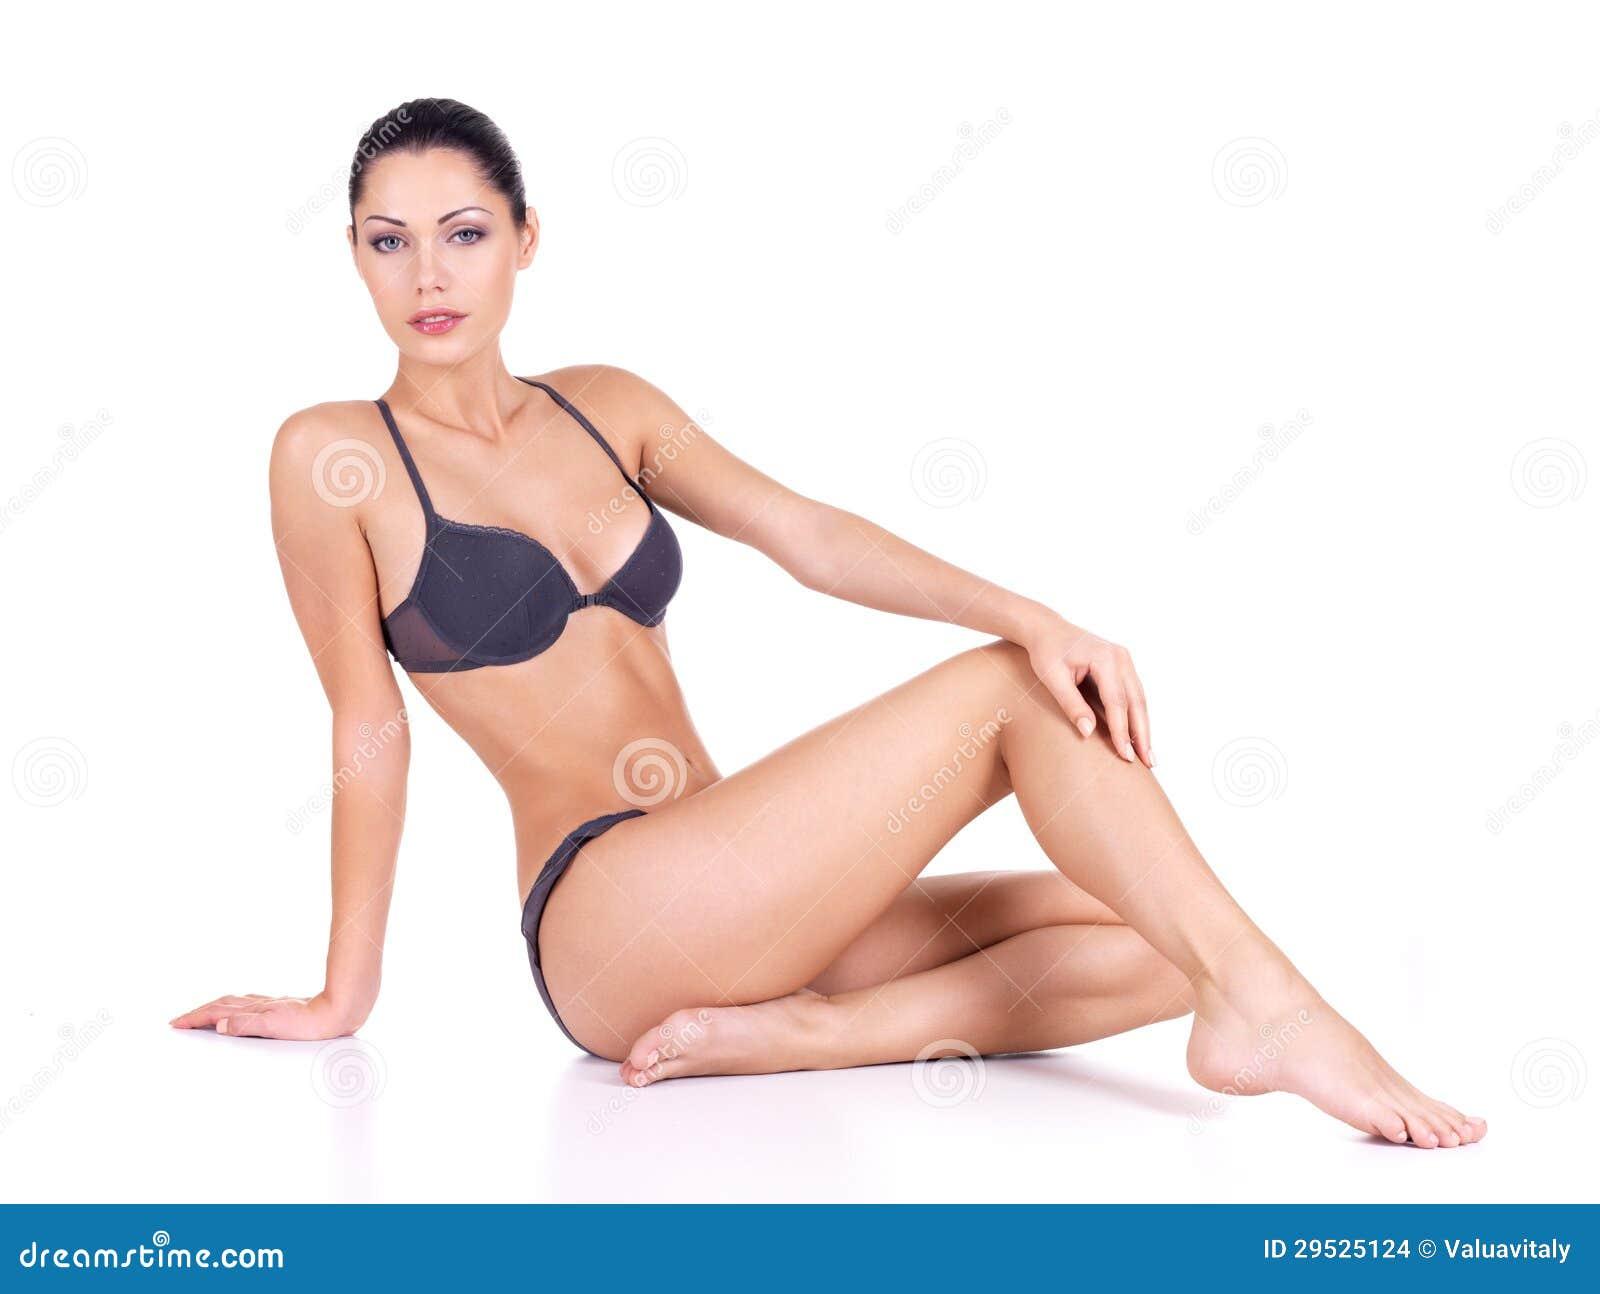 Fotos sexy de piernas delgadas